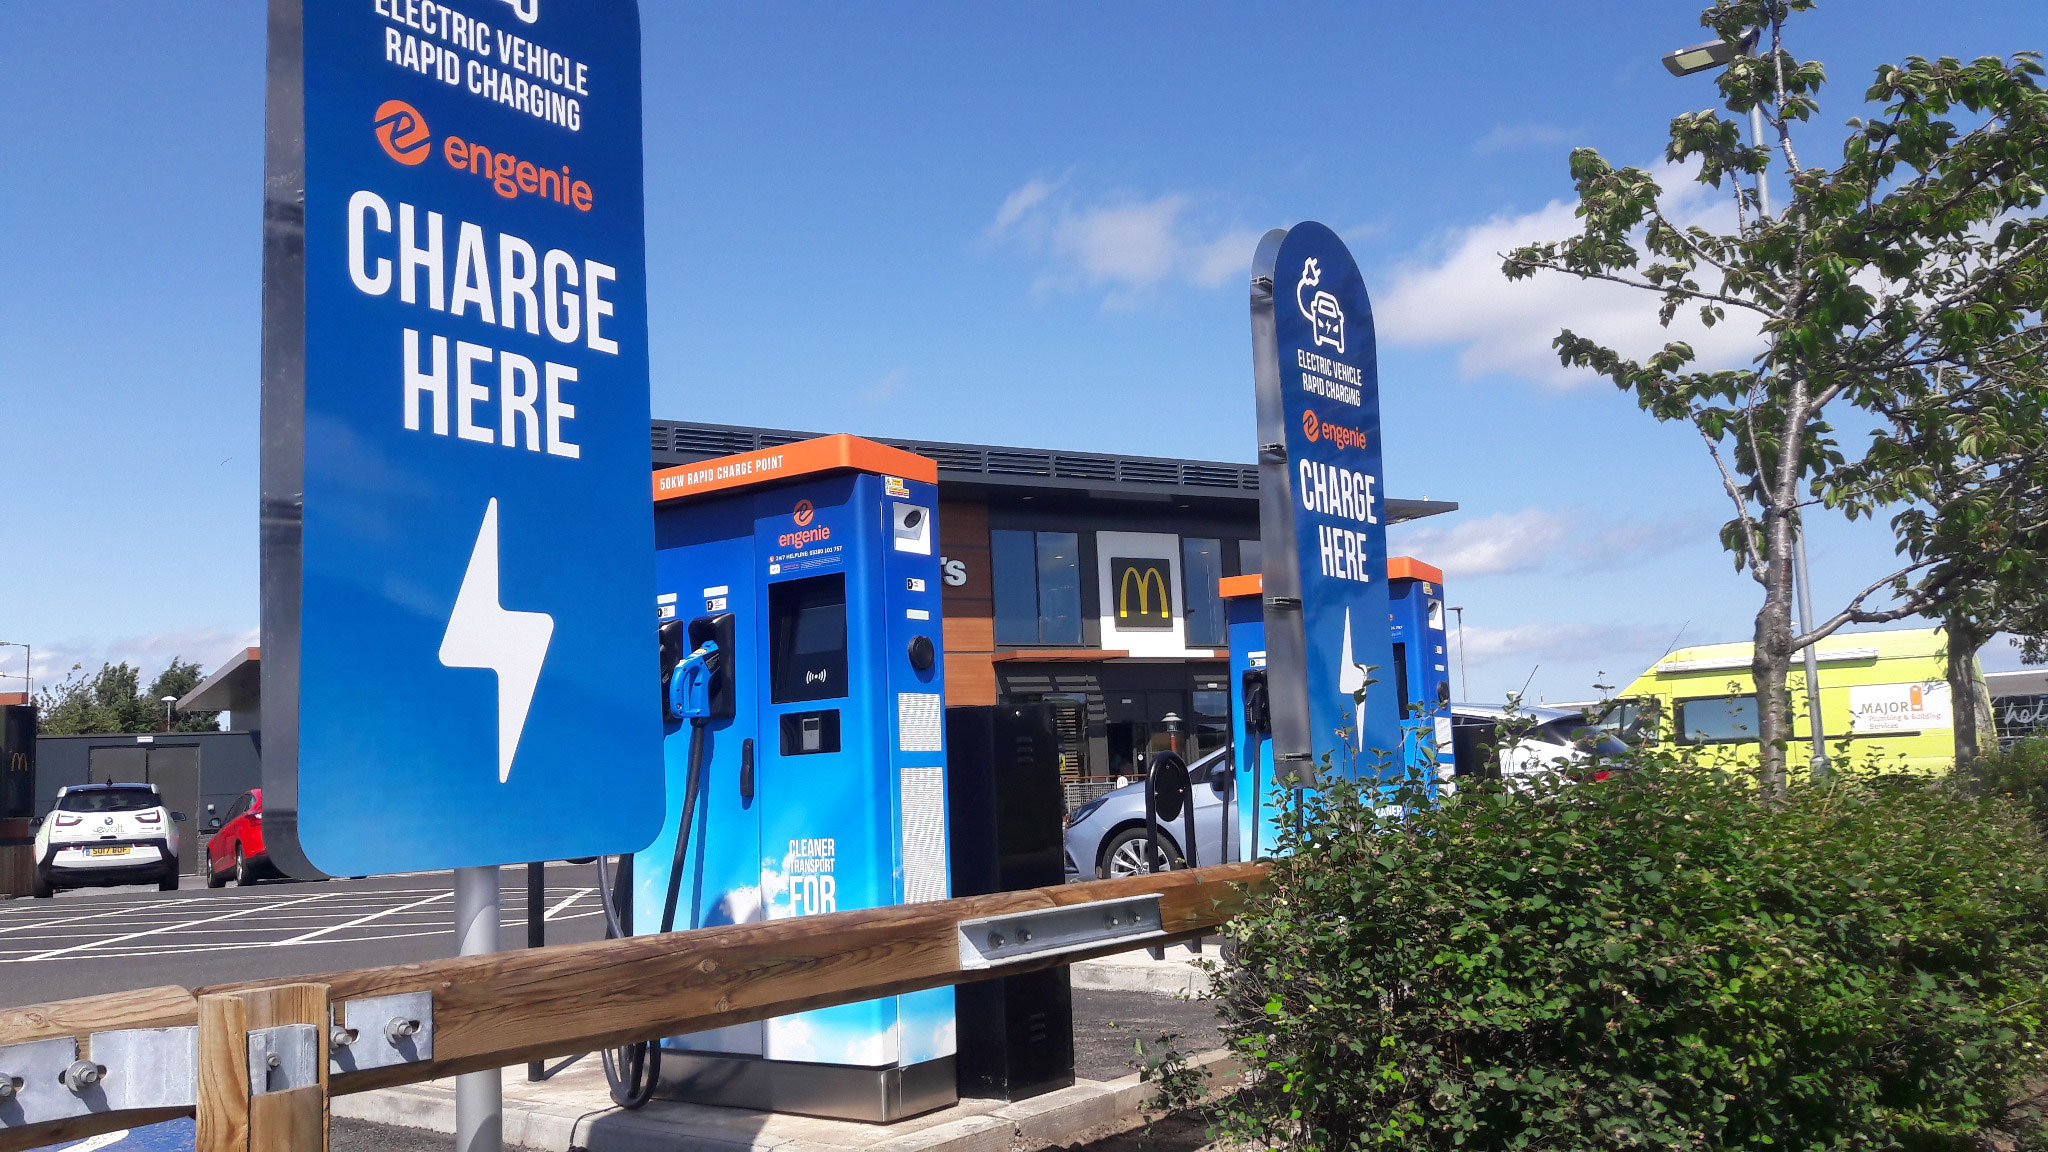 Signmark Car park Management E-guard EV charging signage